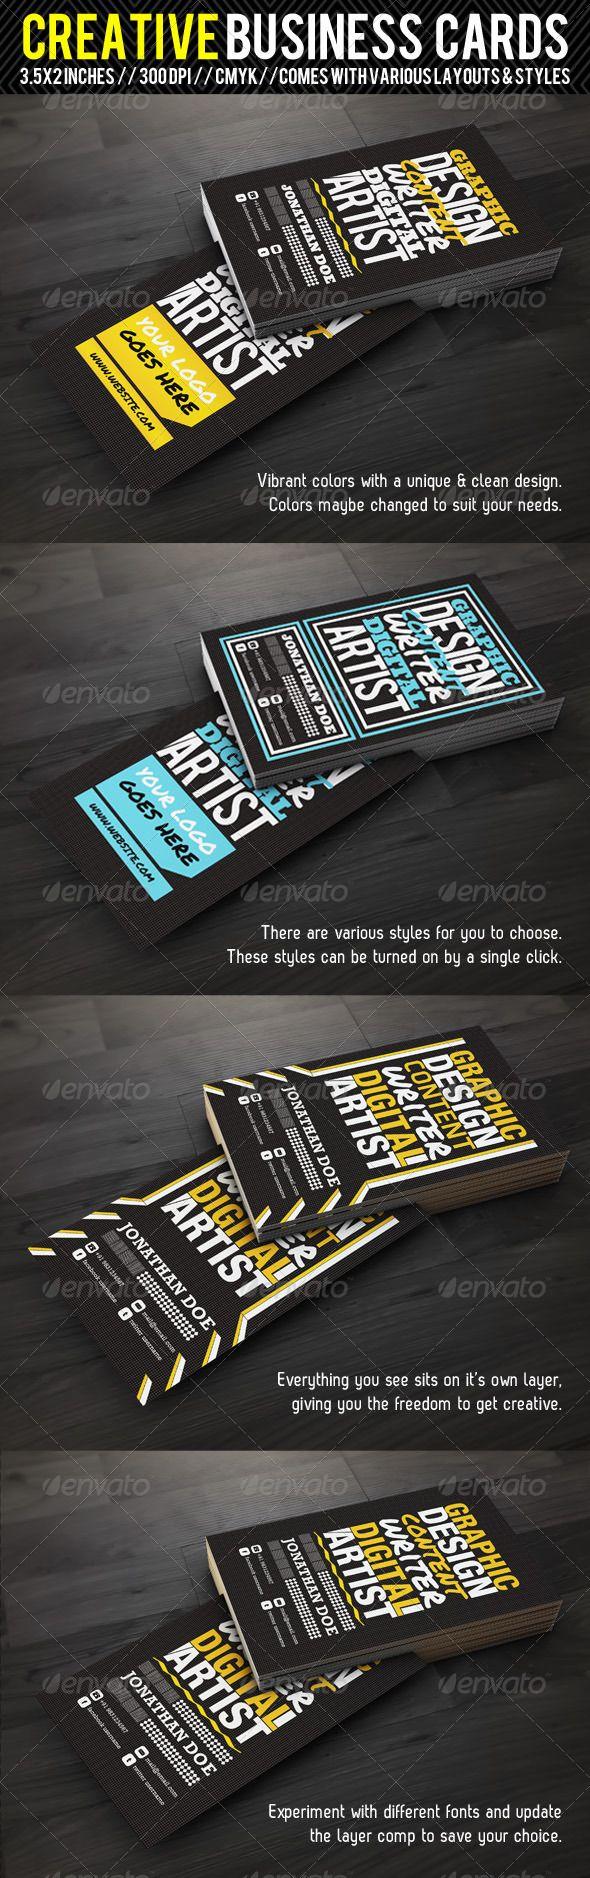 Cassandra cappello graphic design toronto - Creative Designer Business Card 2